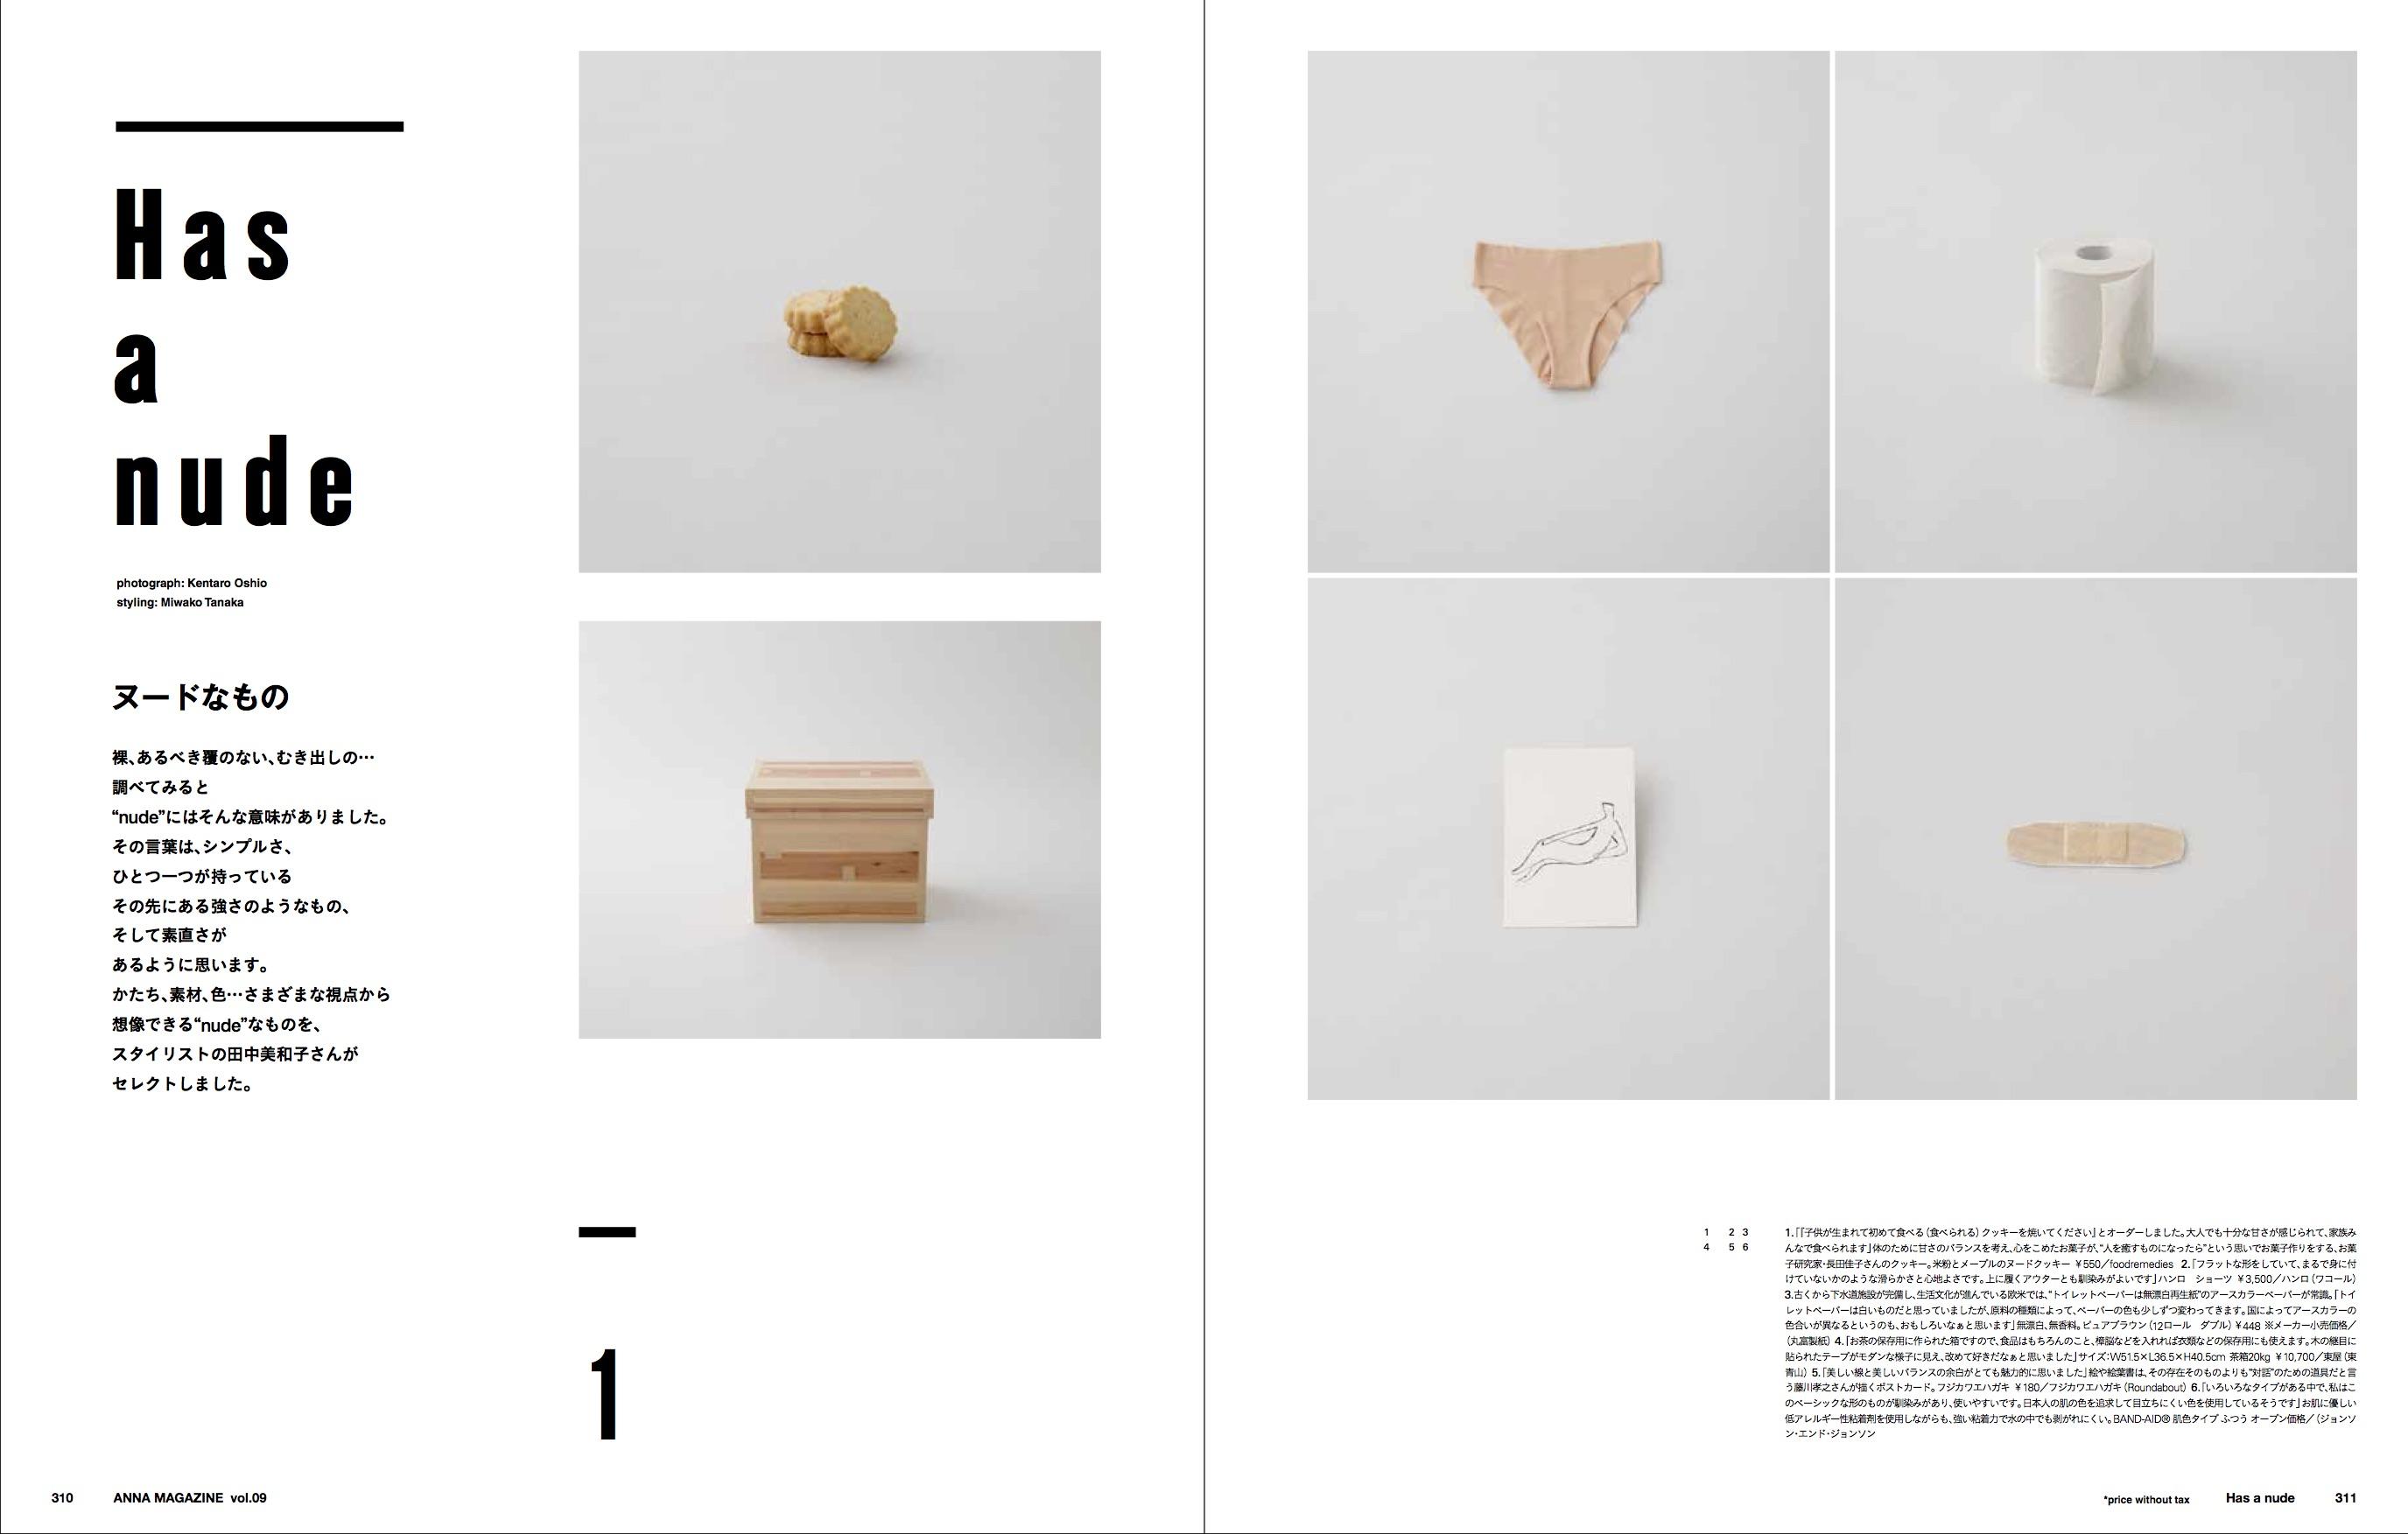 anna magazine vol.9 P151